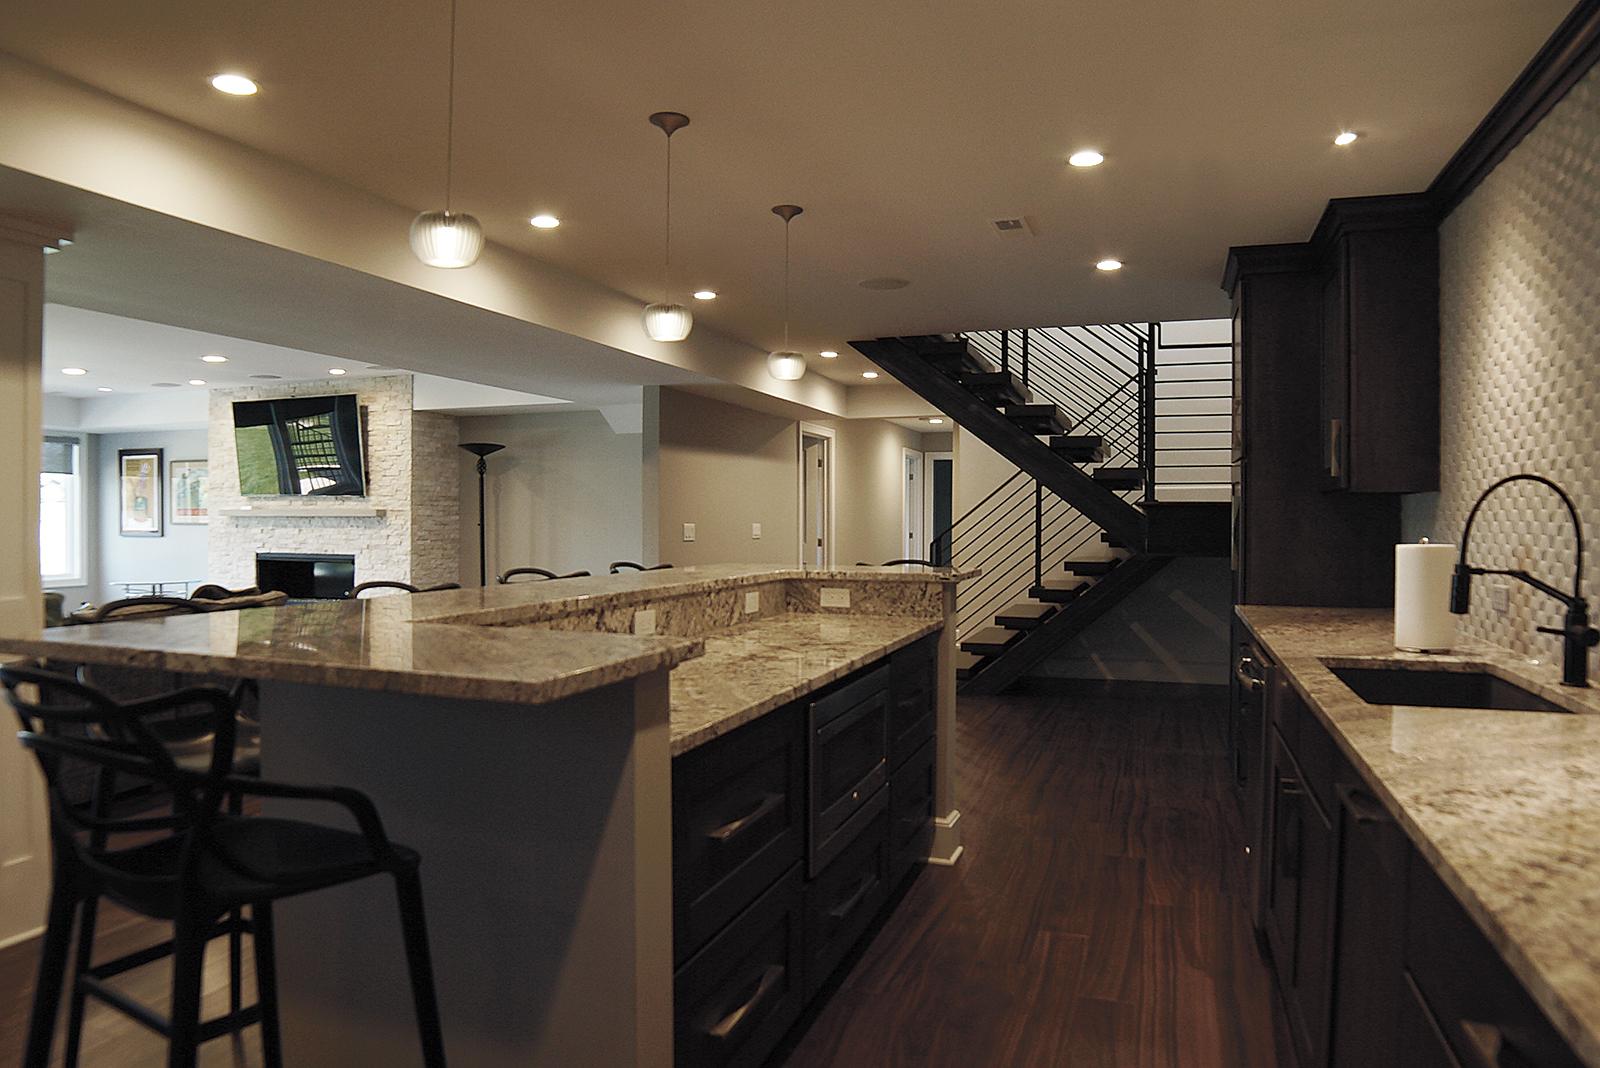 Kitchen_side_DSC06353.jpg